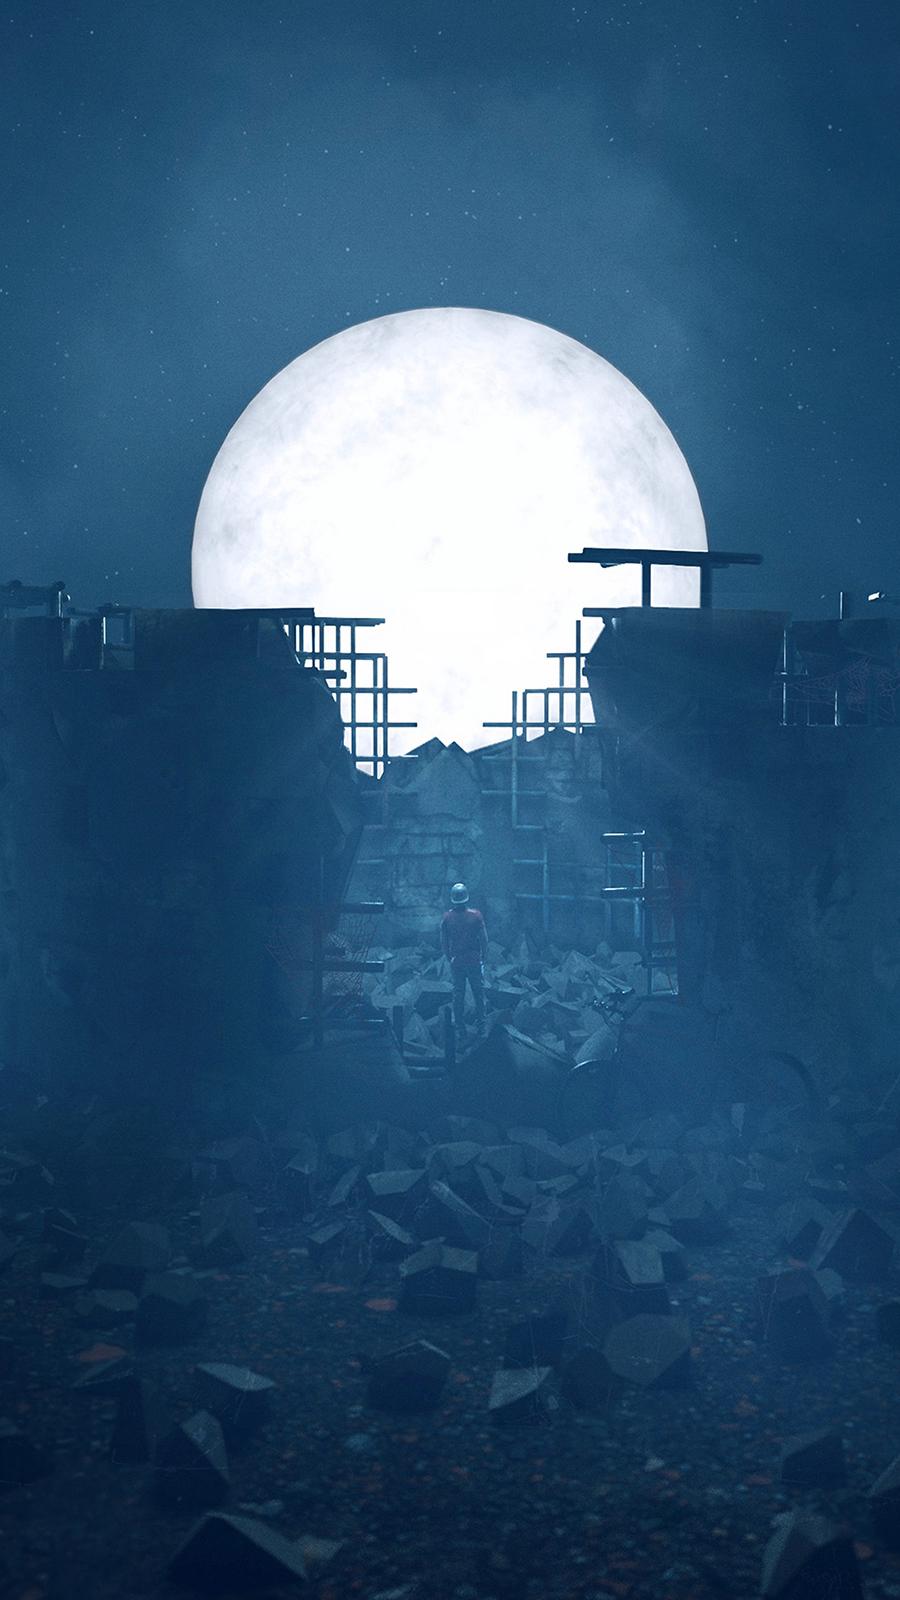 4K Full Moon Wallpapers Free Download